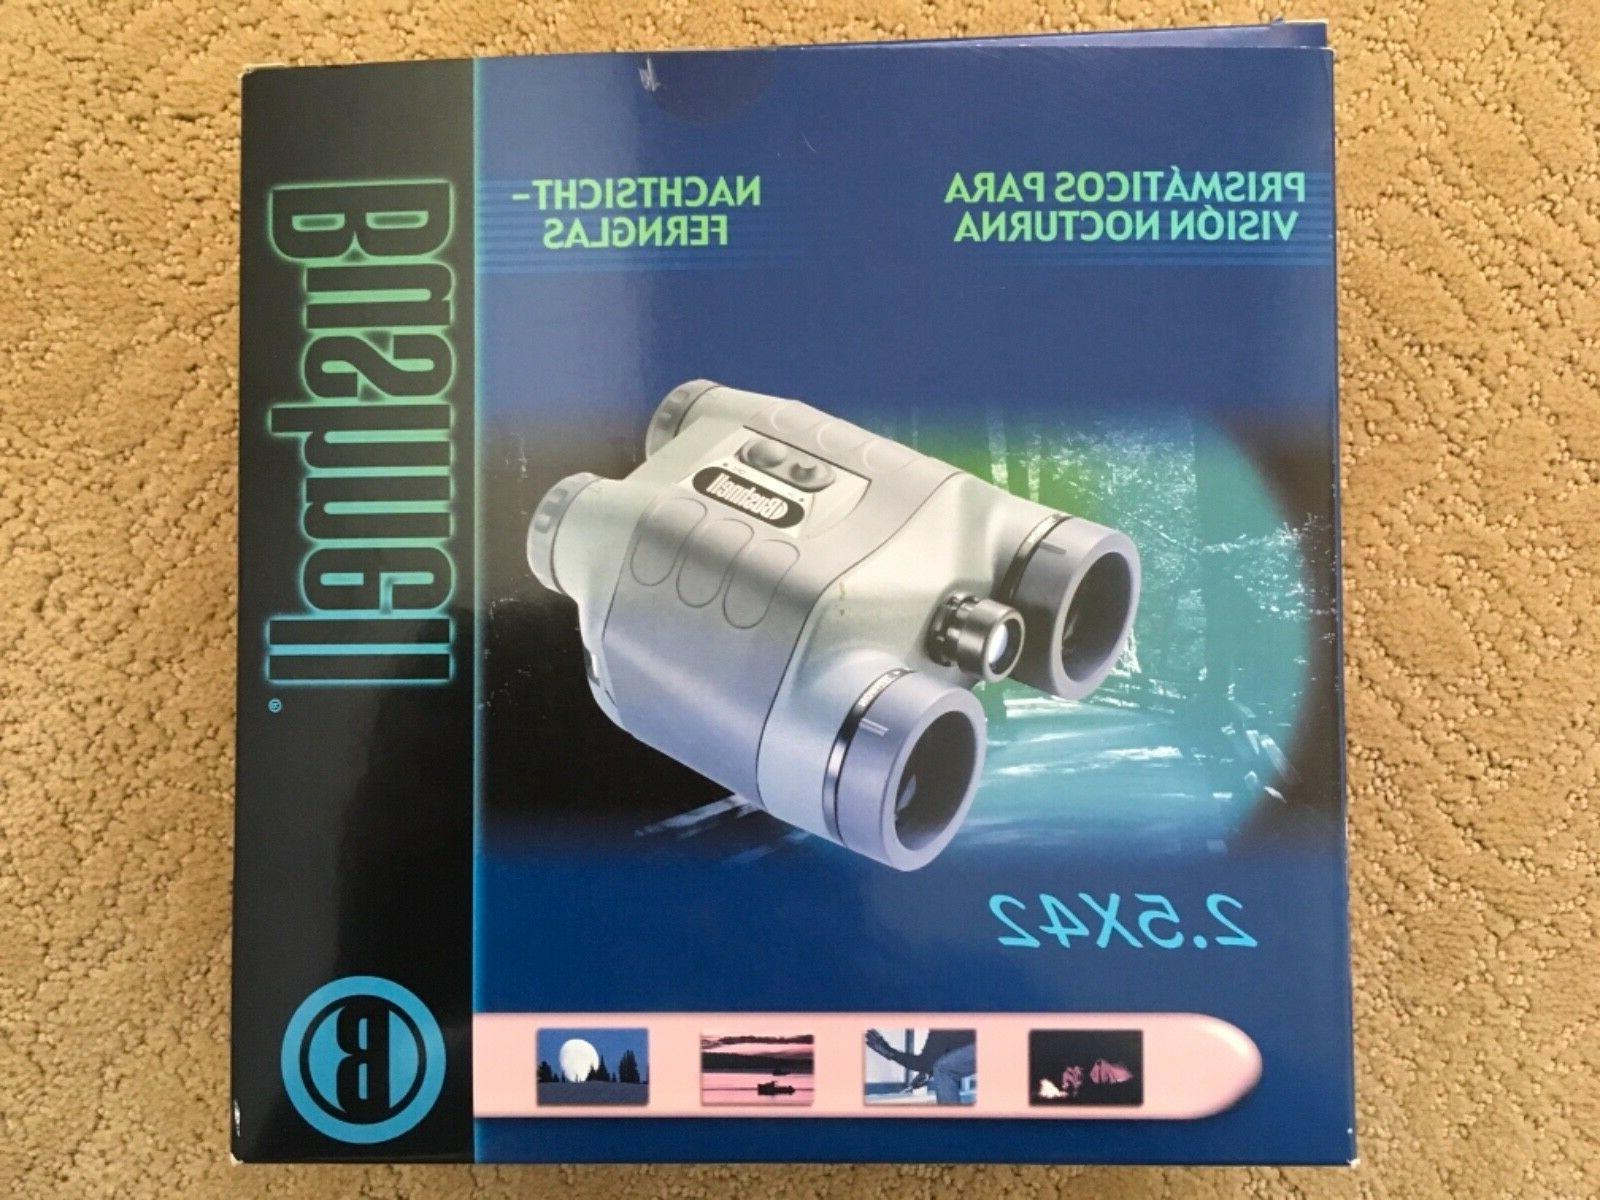 2 5x42 night vision binocular wbuilt in